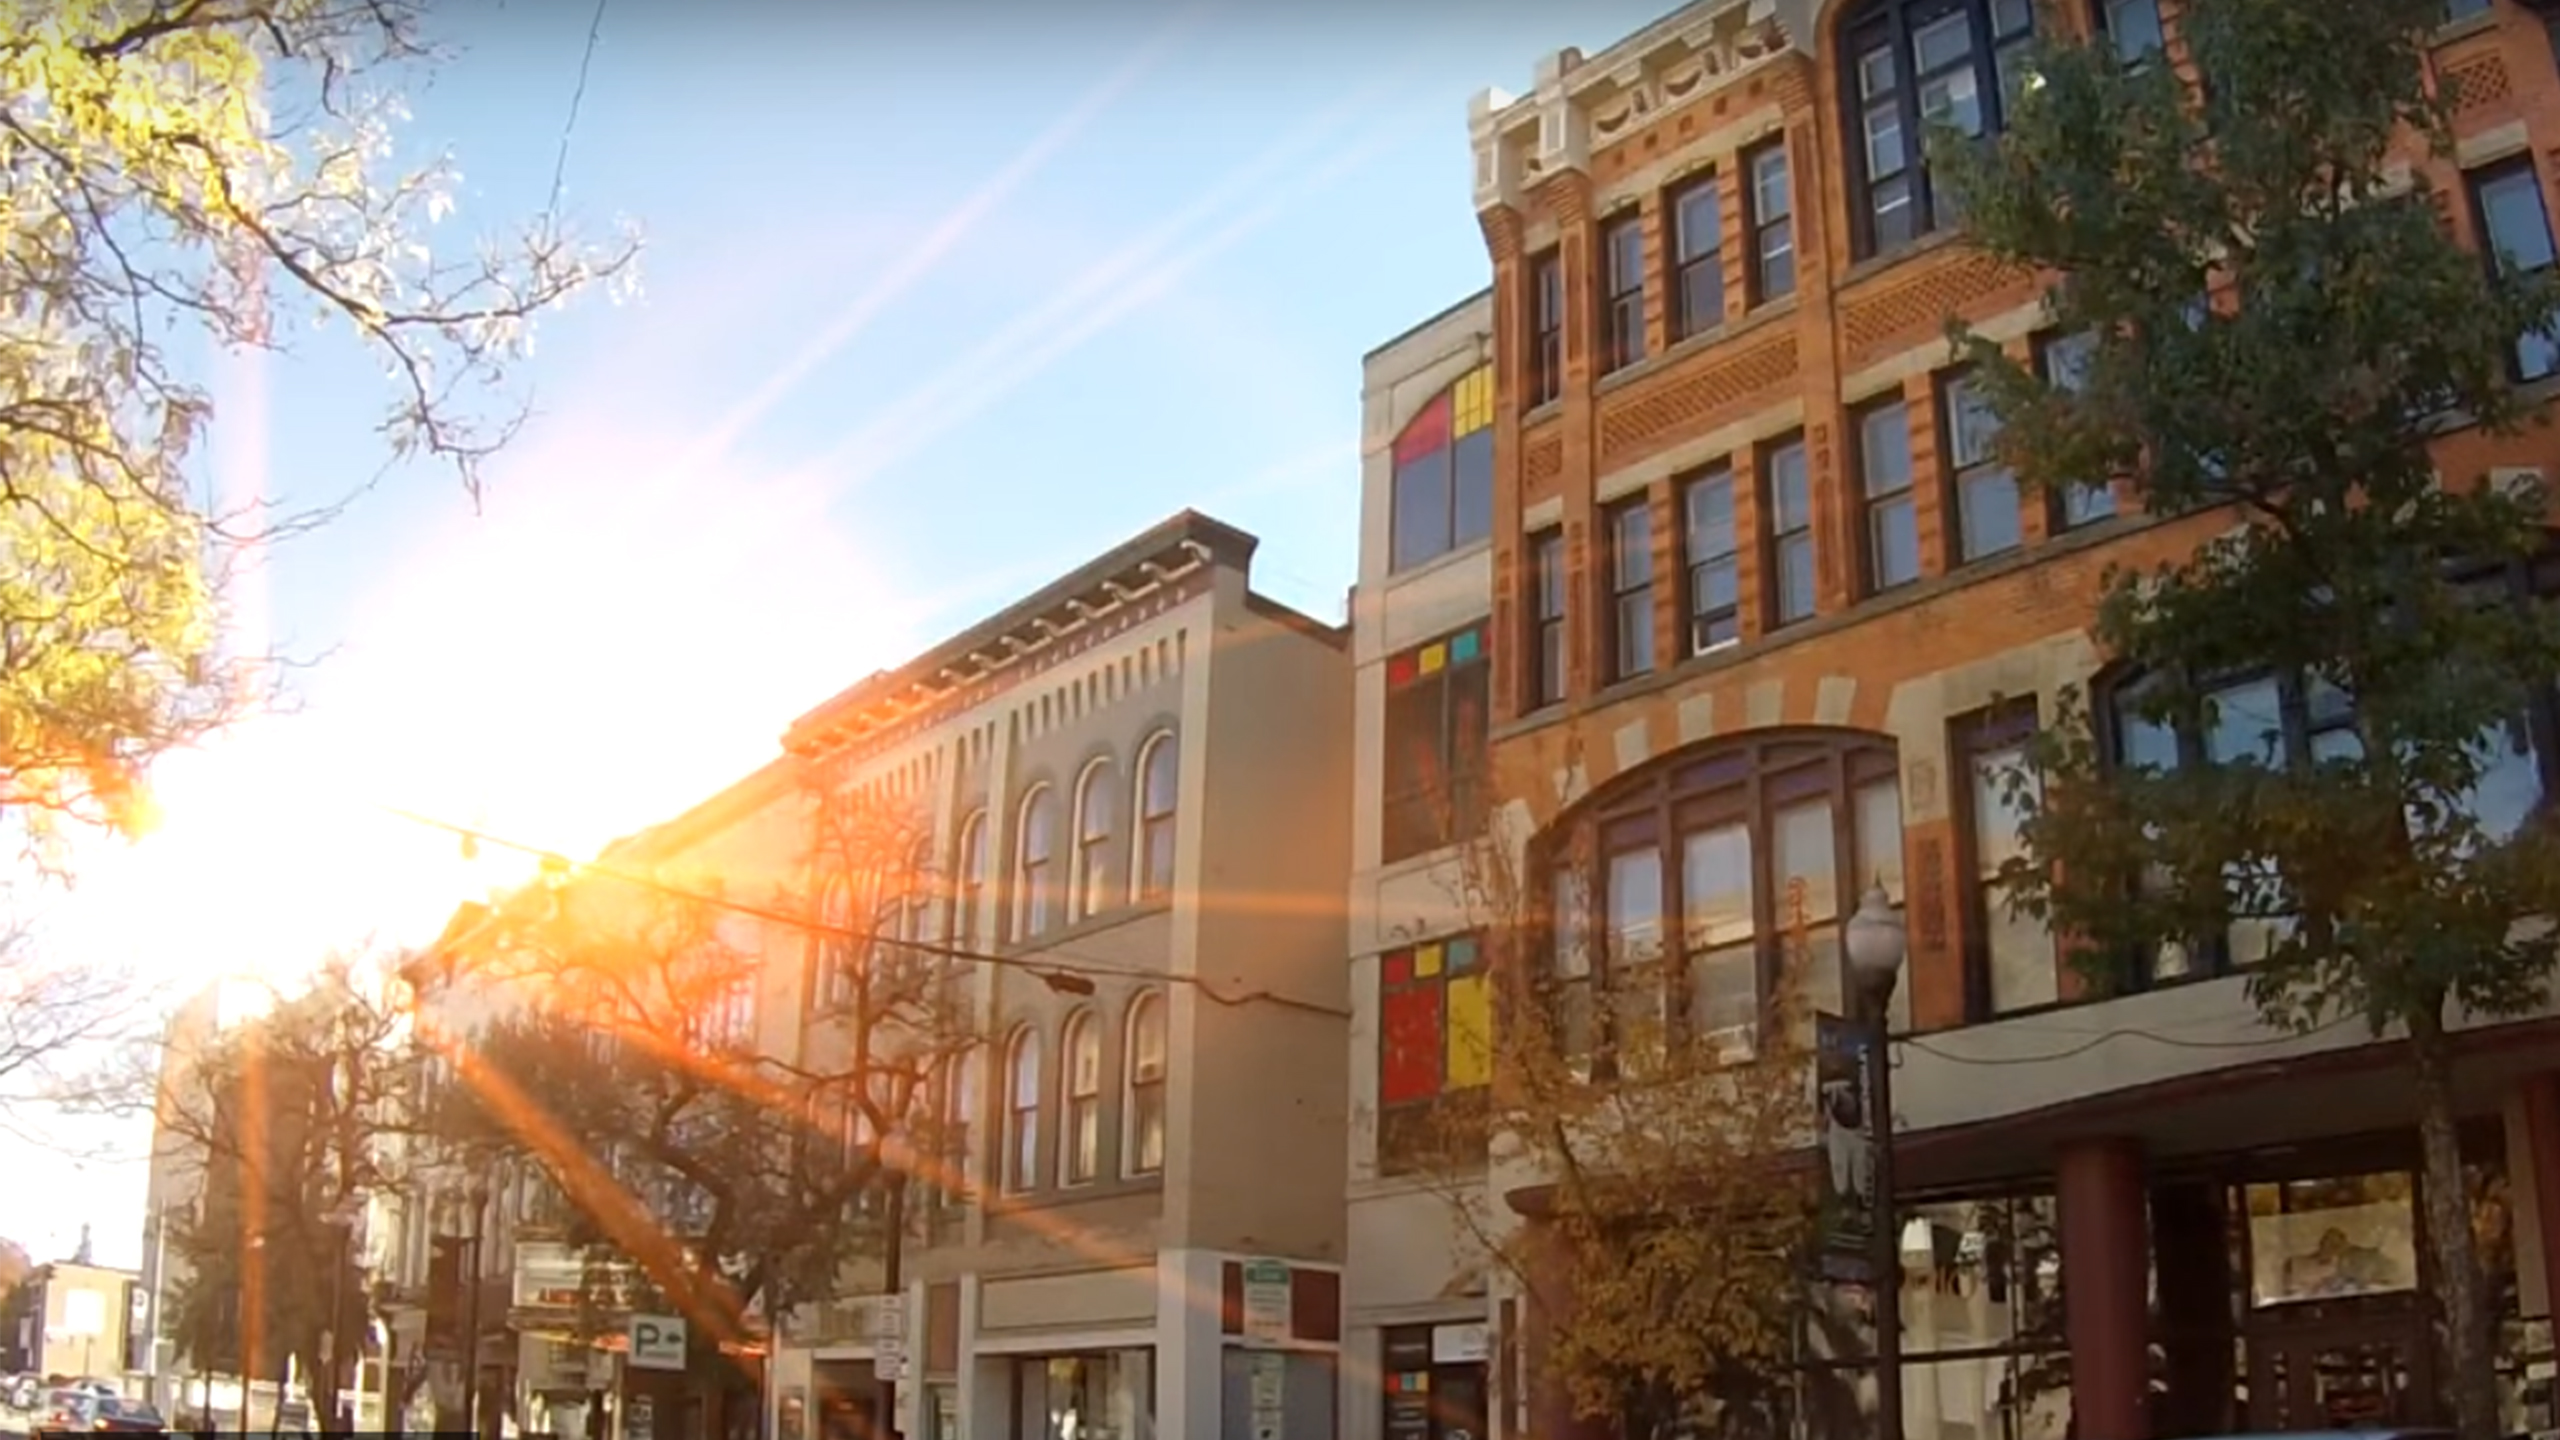 City of Jamestown NY Third Street Sunrise